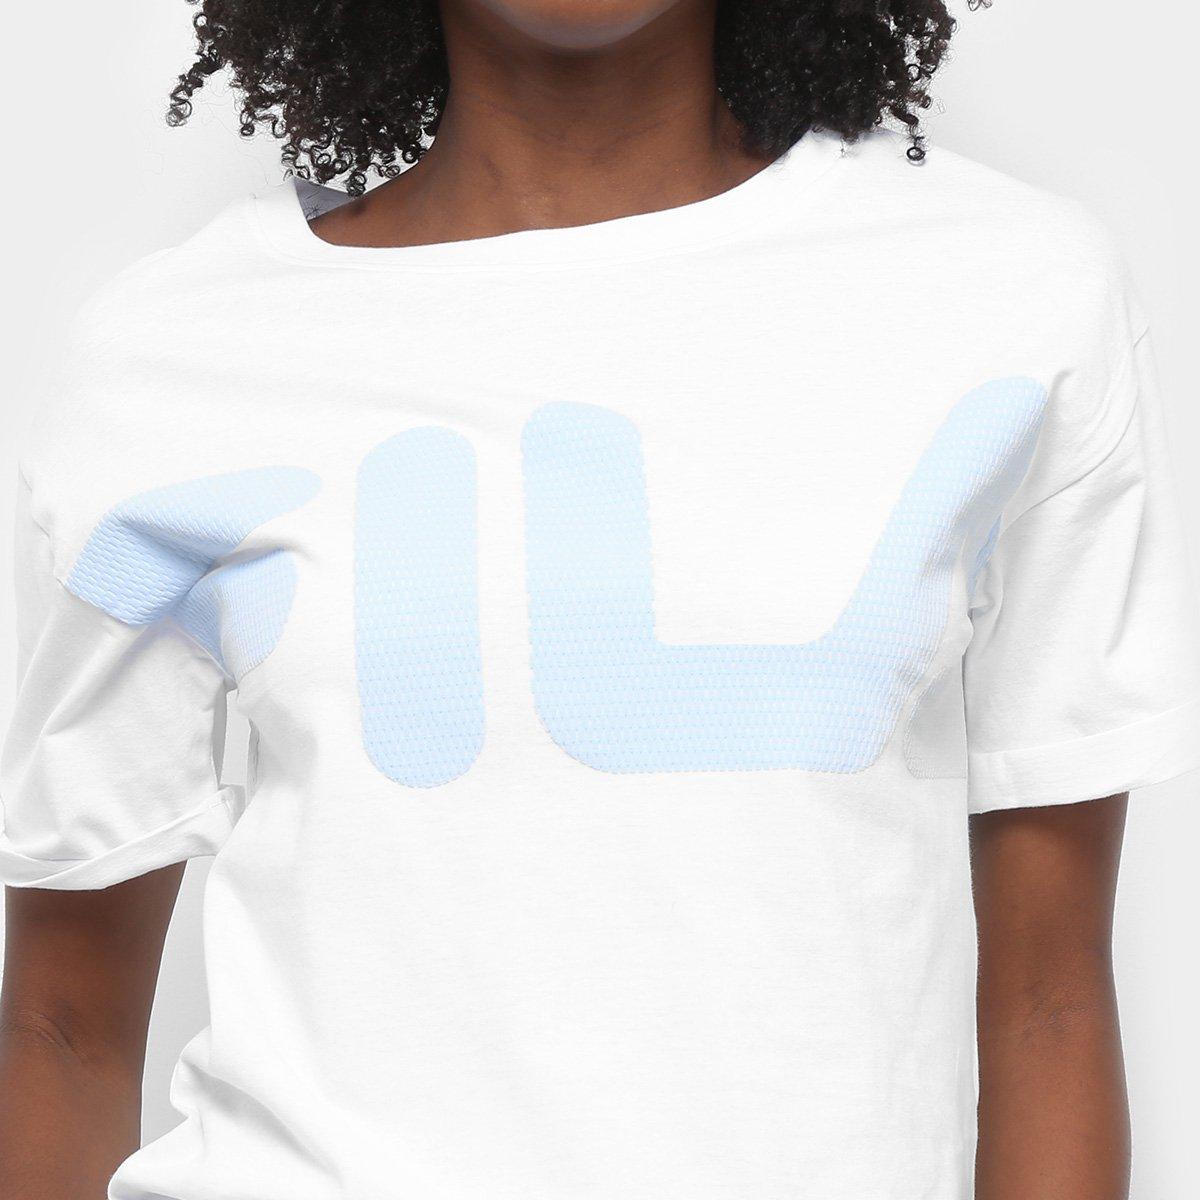 Fila Camiseta Fine New Feminina Camiseta Fila Feminina Fine New Branco aWqXI1I